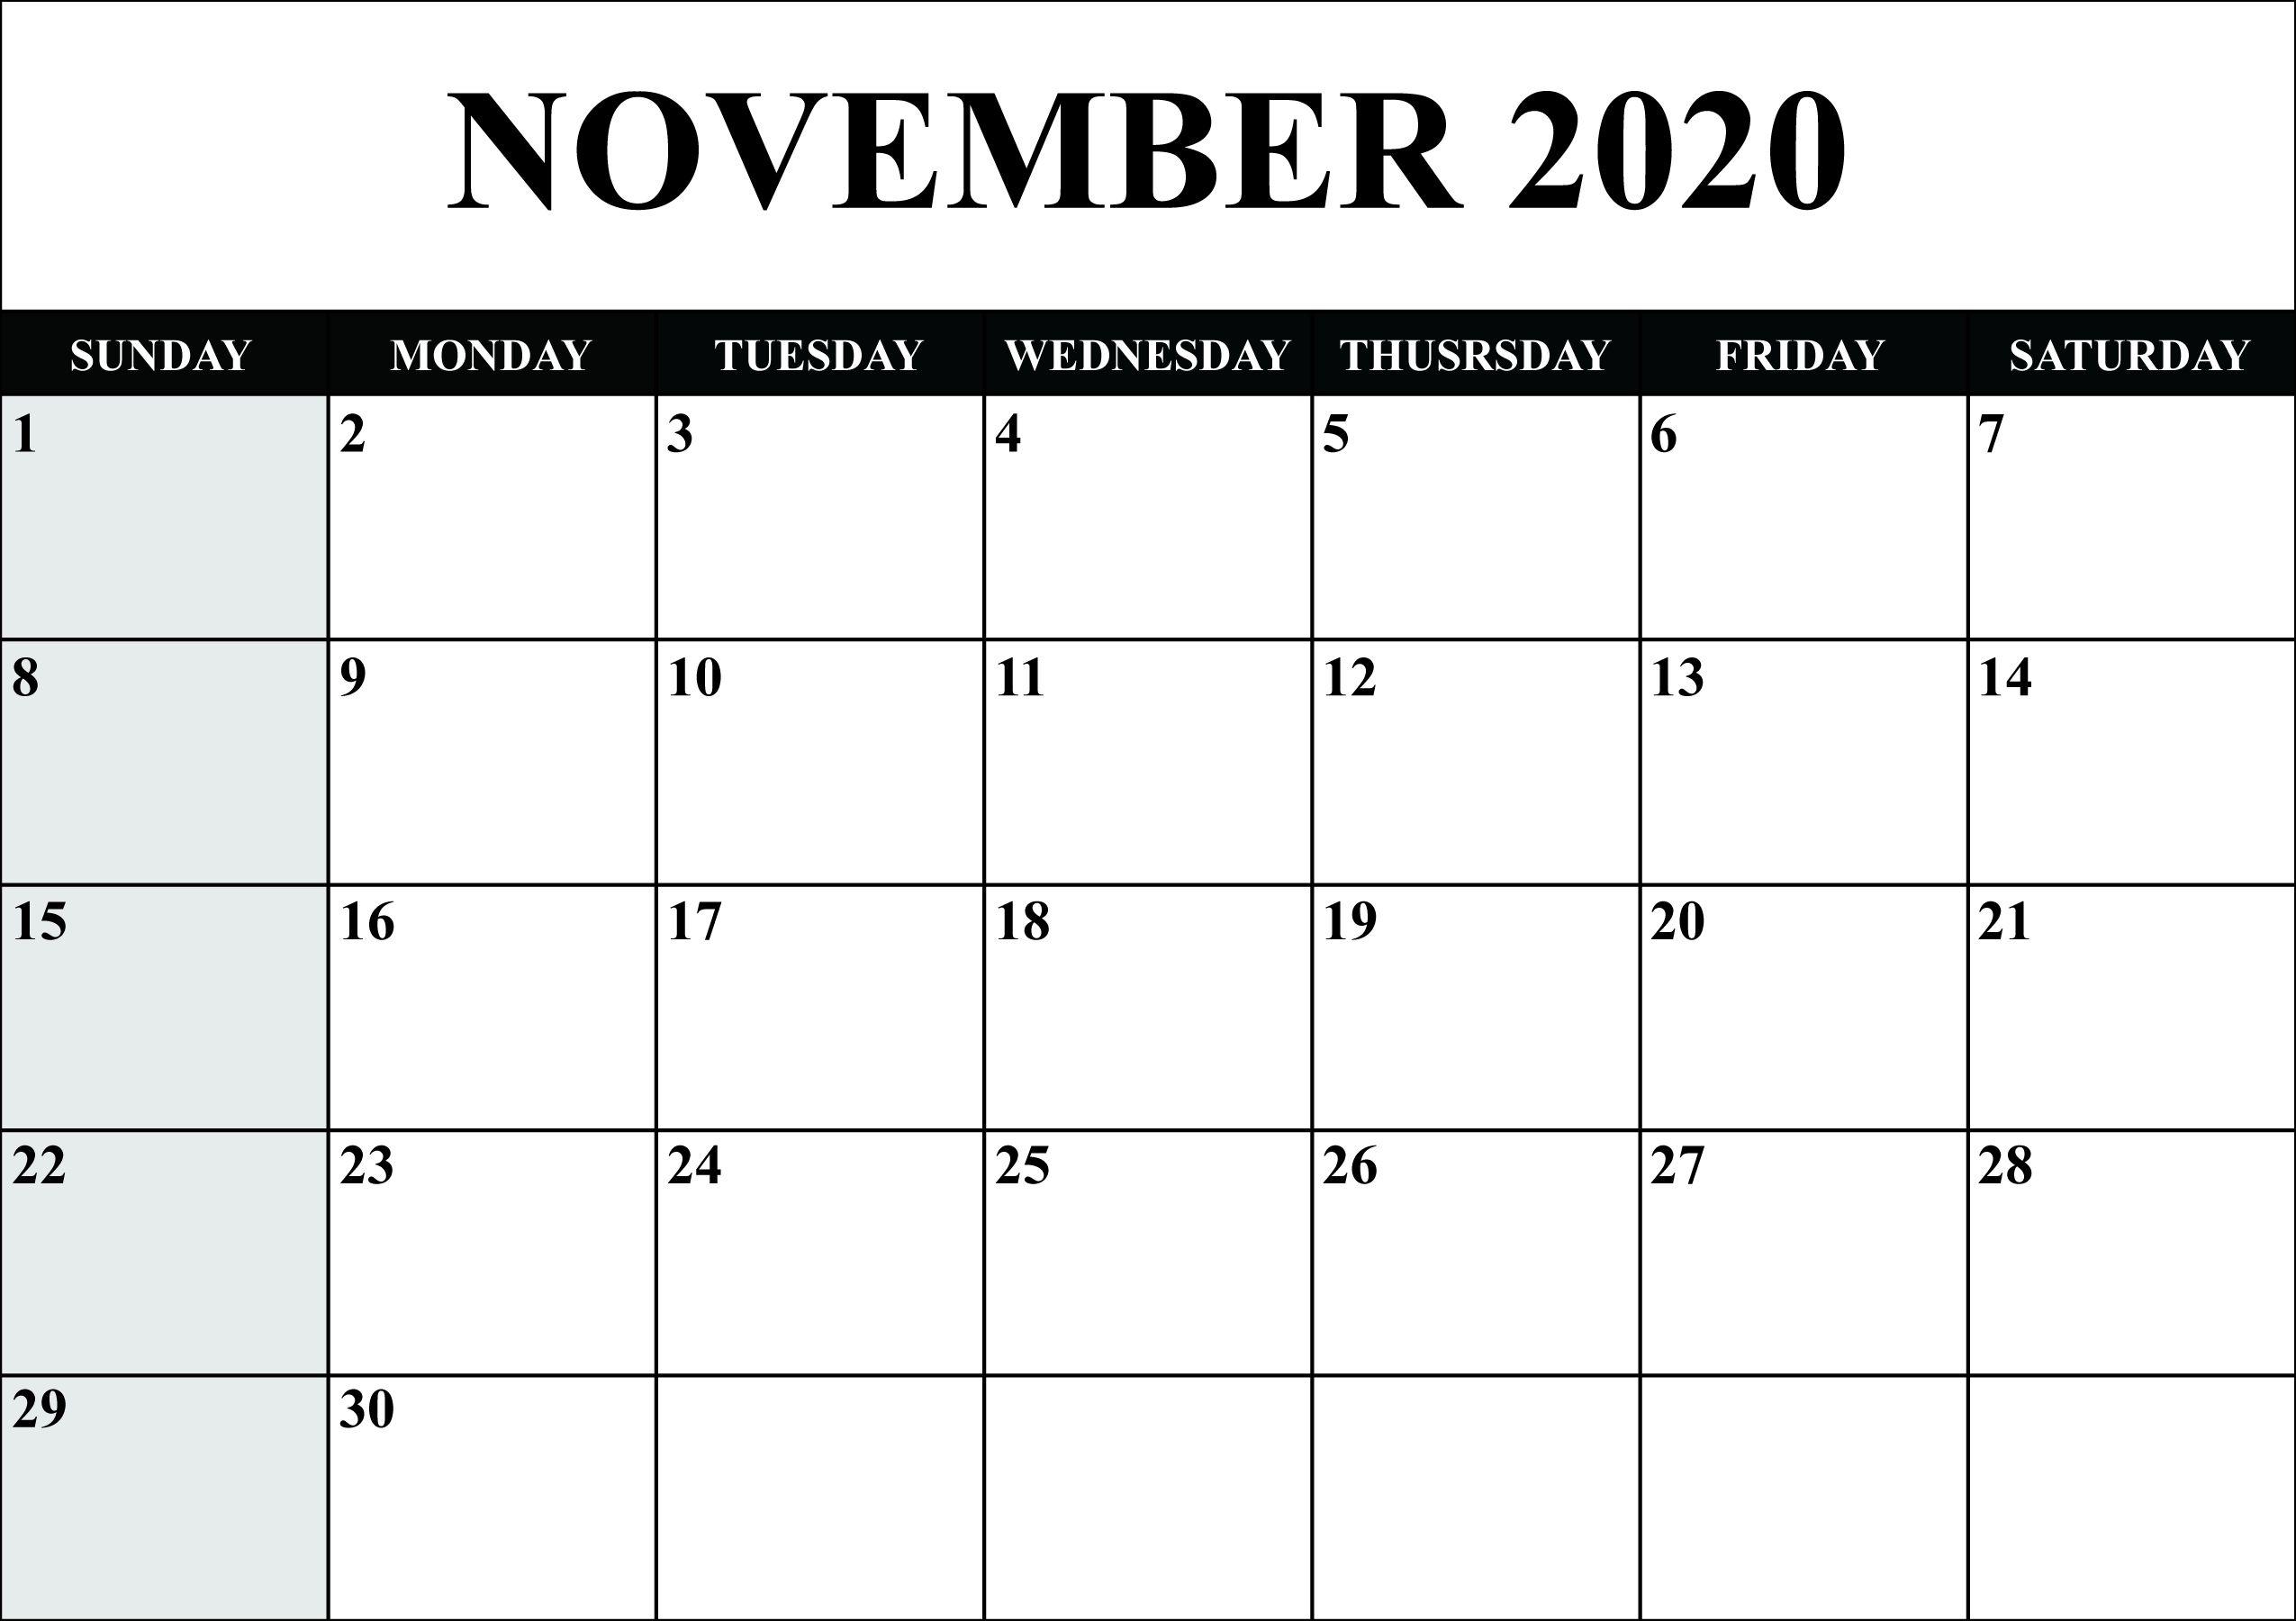 Incredible Ms Word Free Download Calendar 2020 In 2020 November Calendar Calendar Template Monthly Calendar Printable